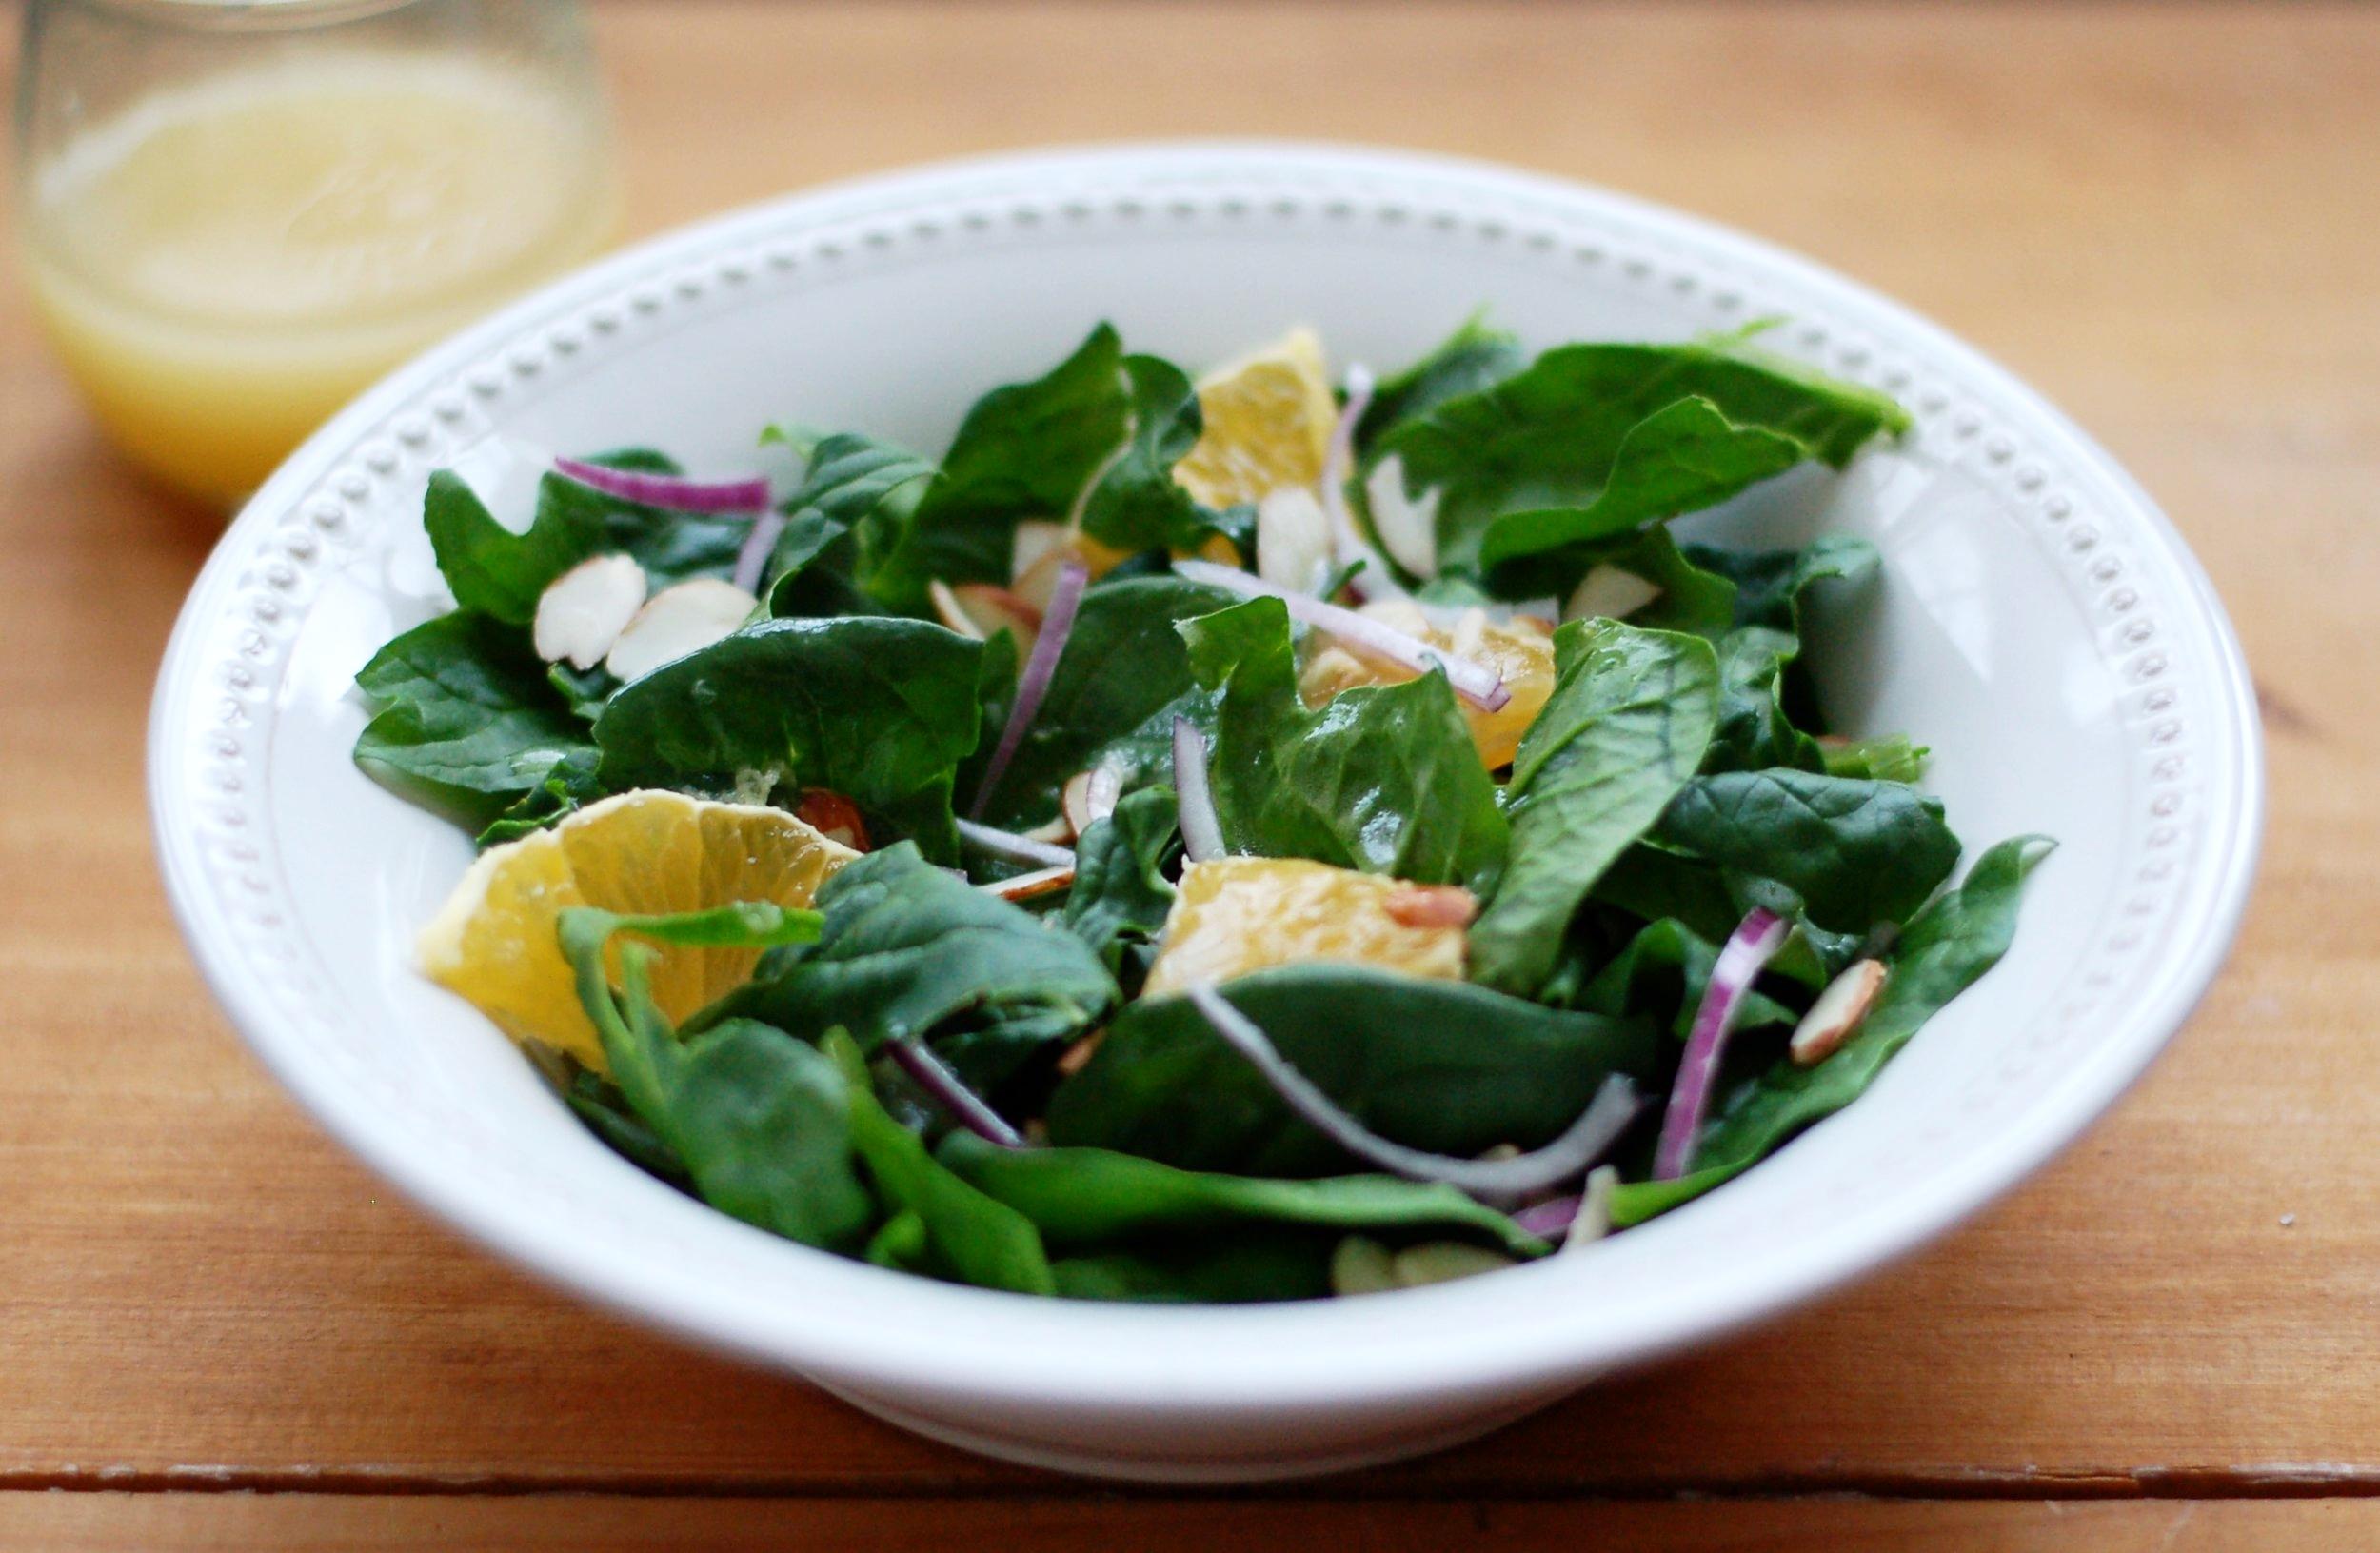 Spinach Salad with Orange Ginger Vinaigrette